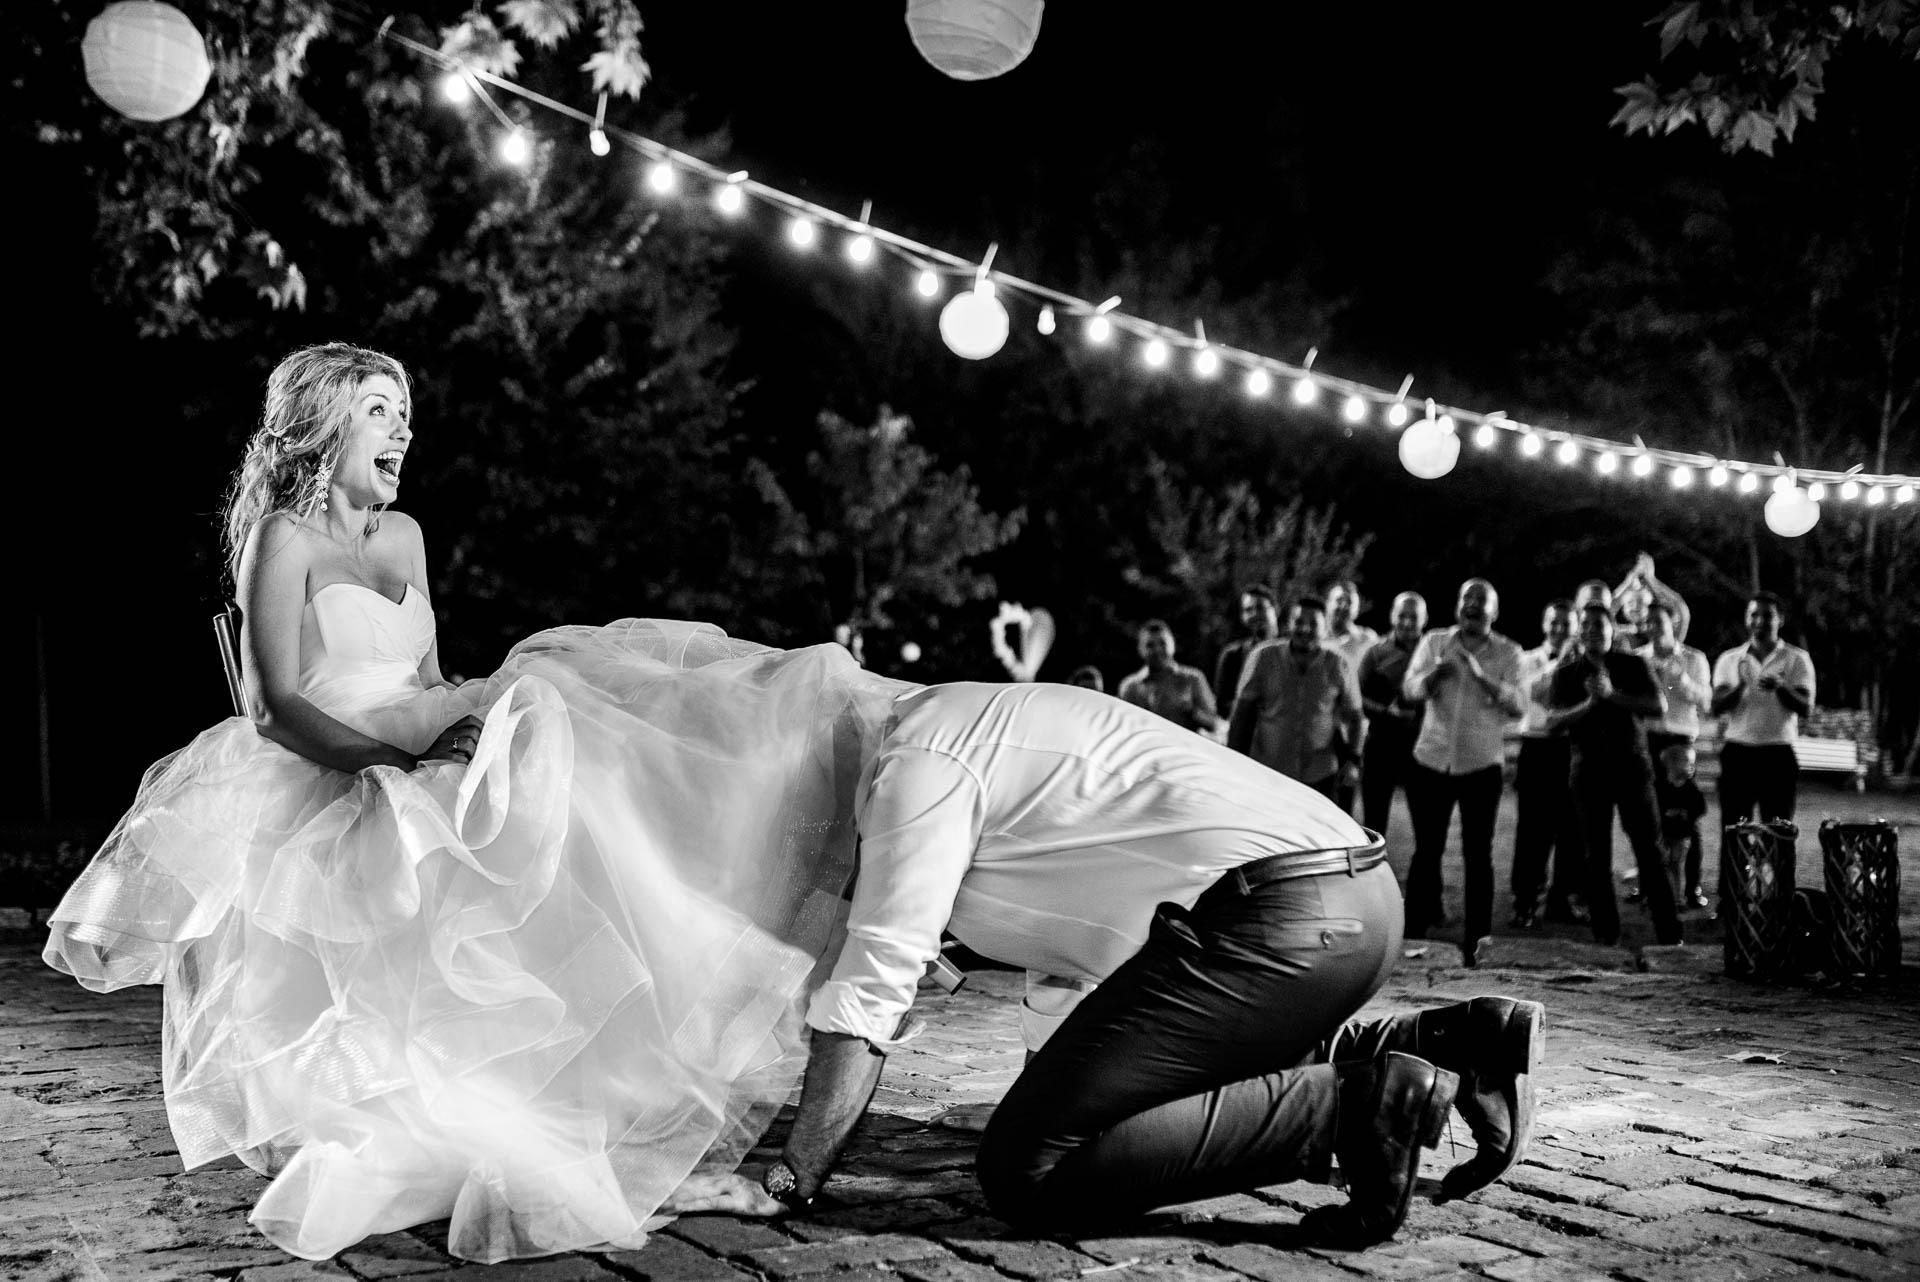 Hristina Handzhieva是一位婚禮攝影師